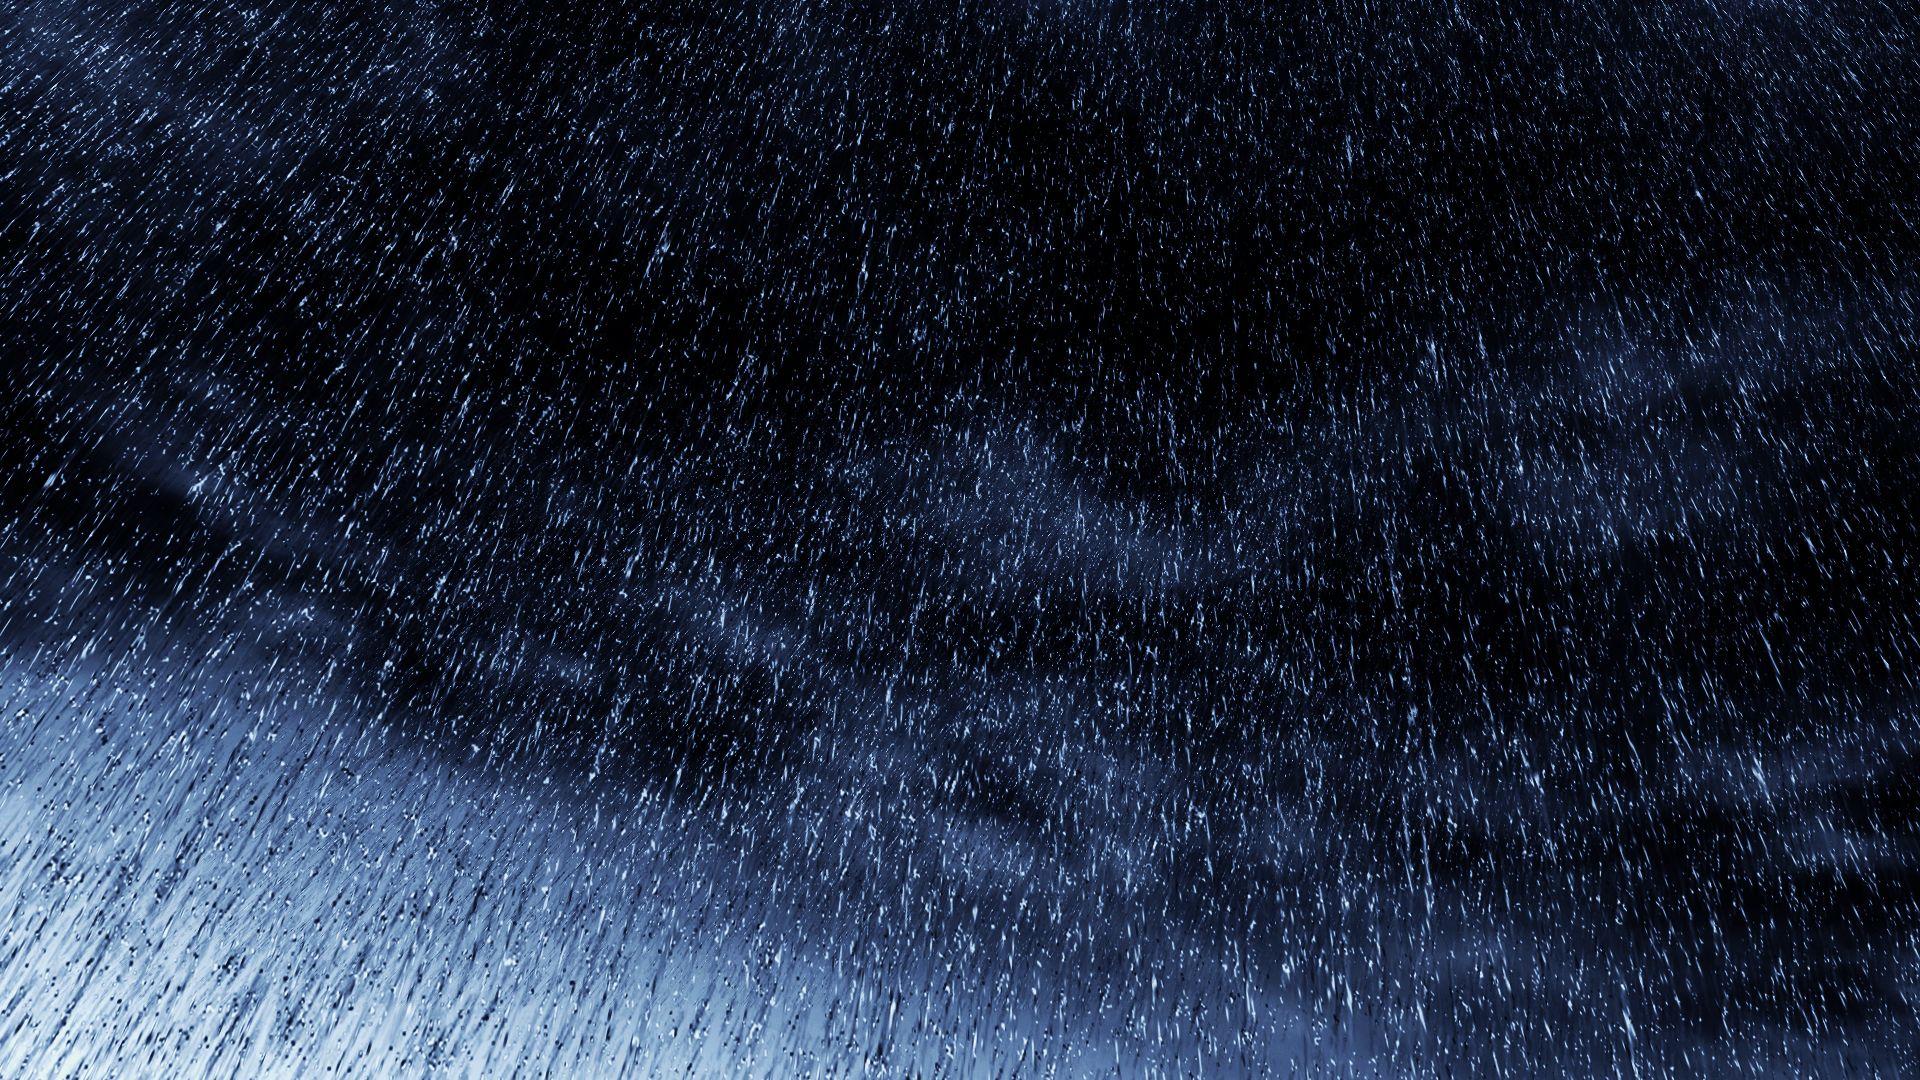 rain hd wallpapers 227 night dark backgrounds wallpaper c